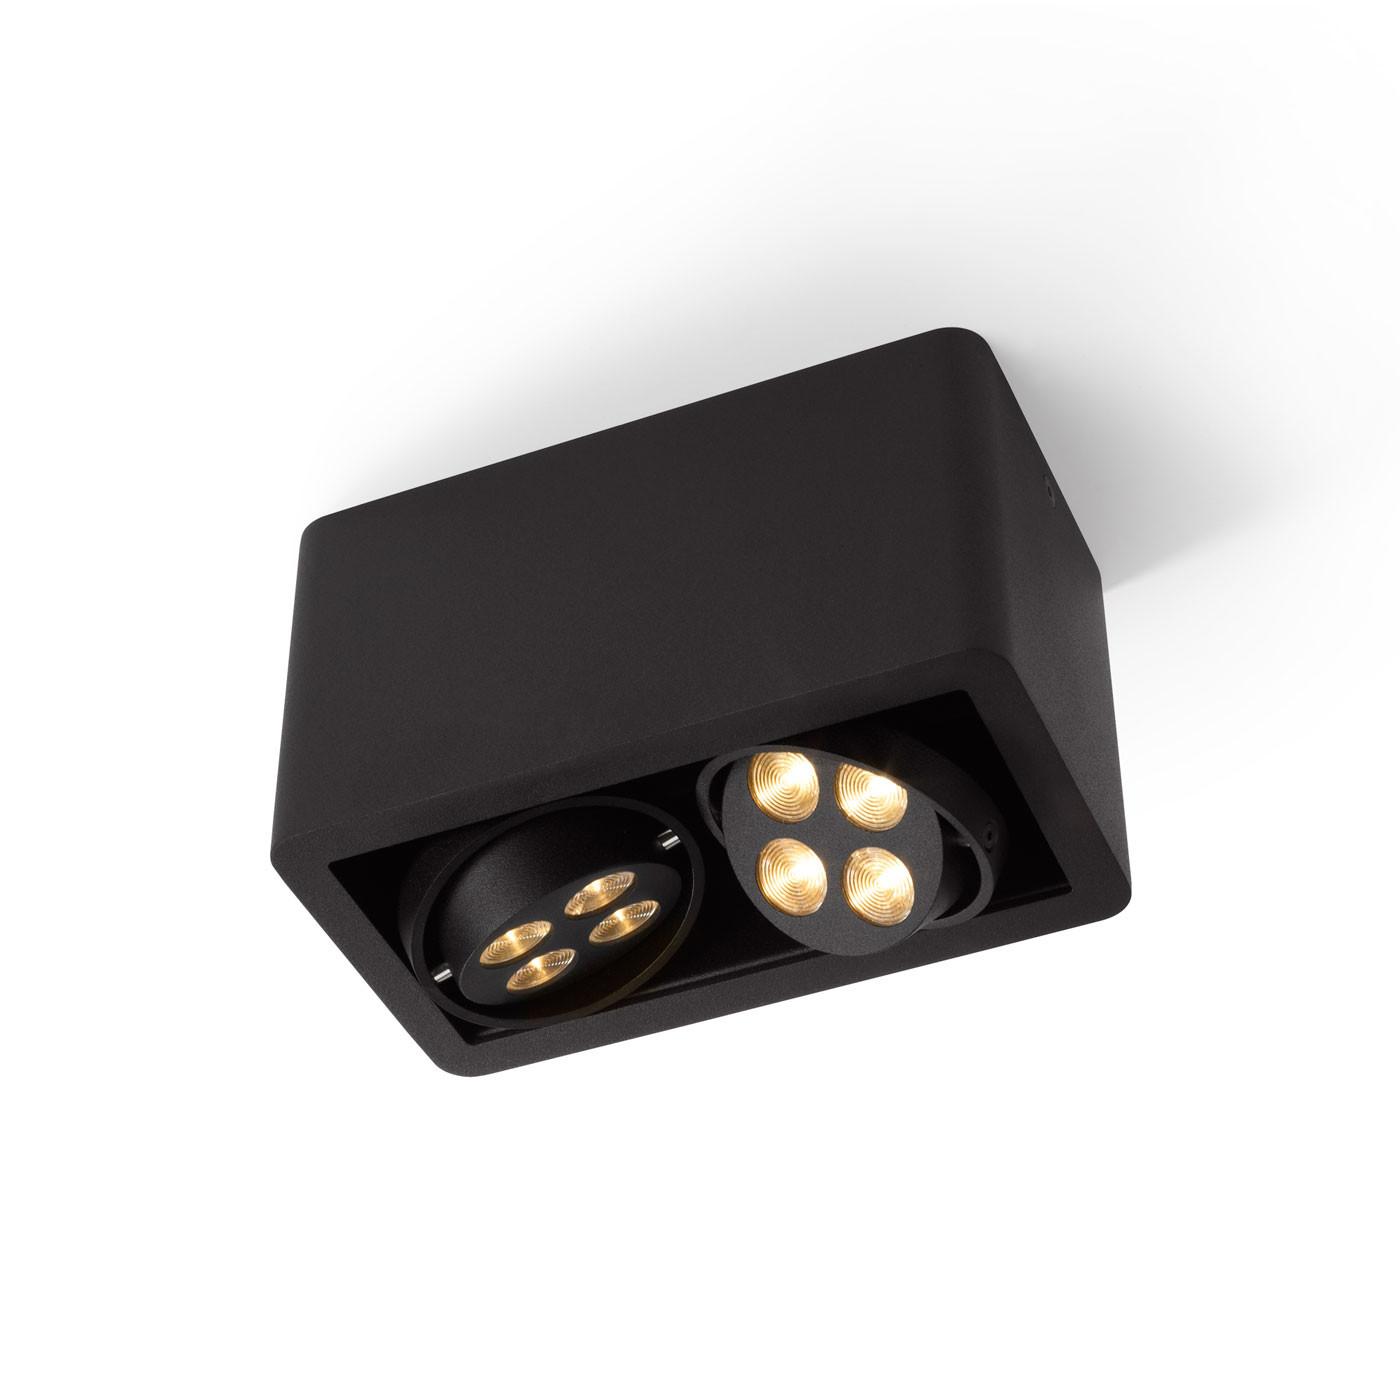 Trizo21 R52 Up LED 10° Deckenspot